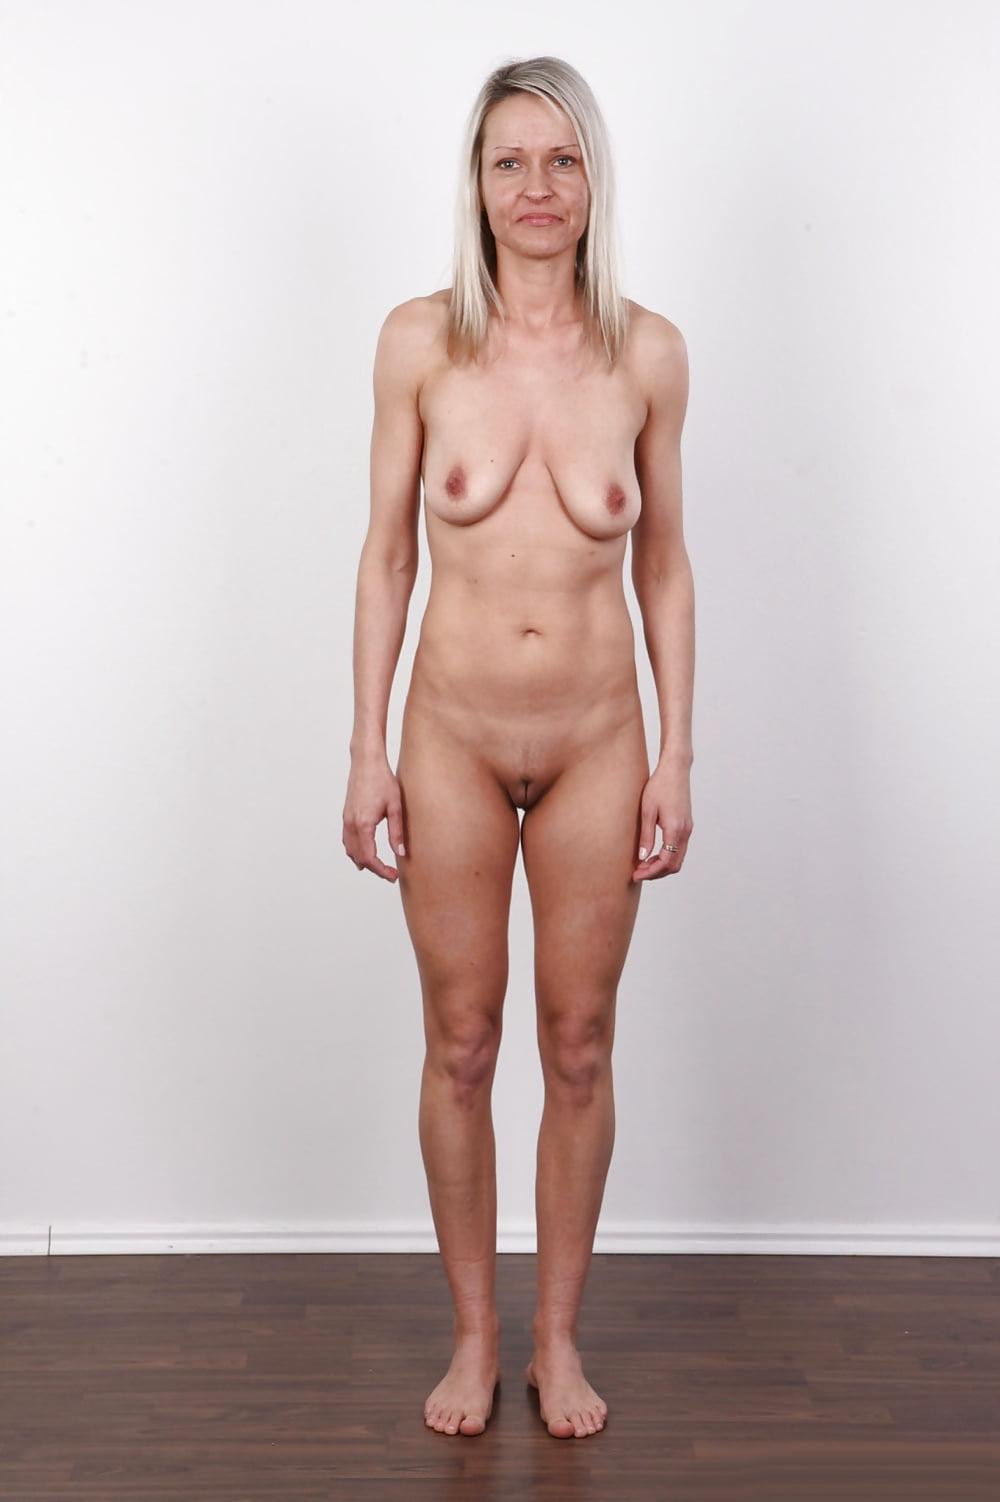 Super skinny women standing porn pics wetting porn